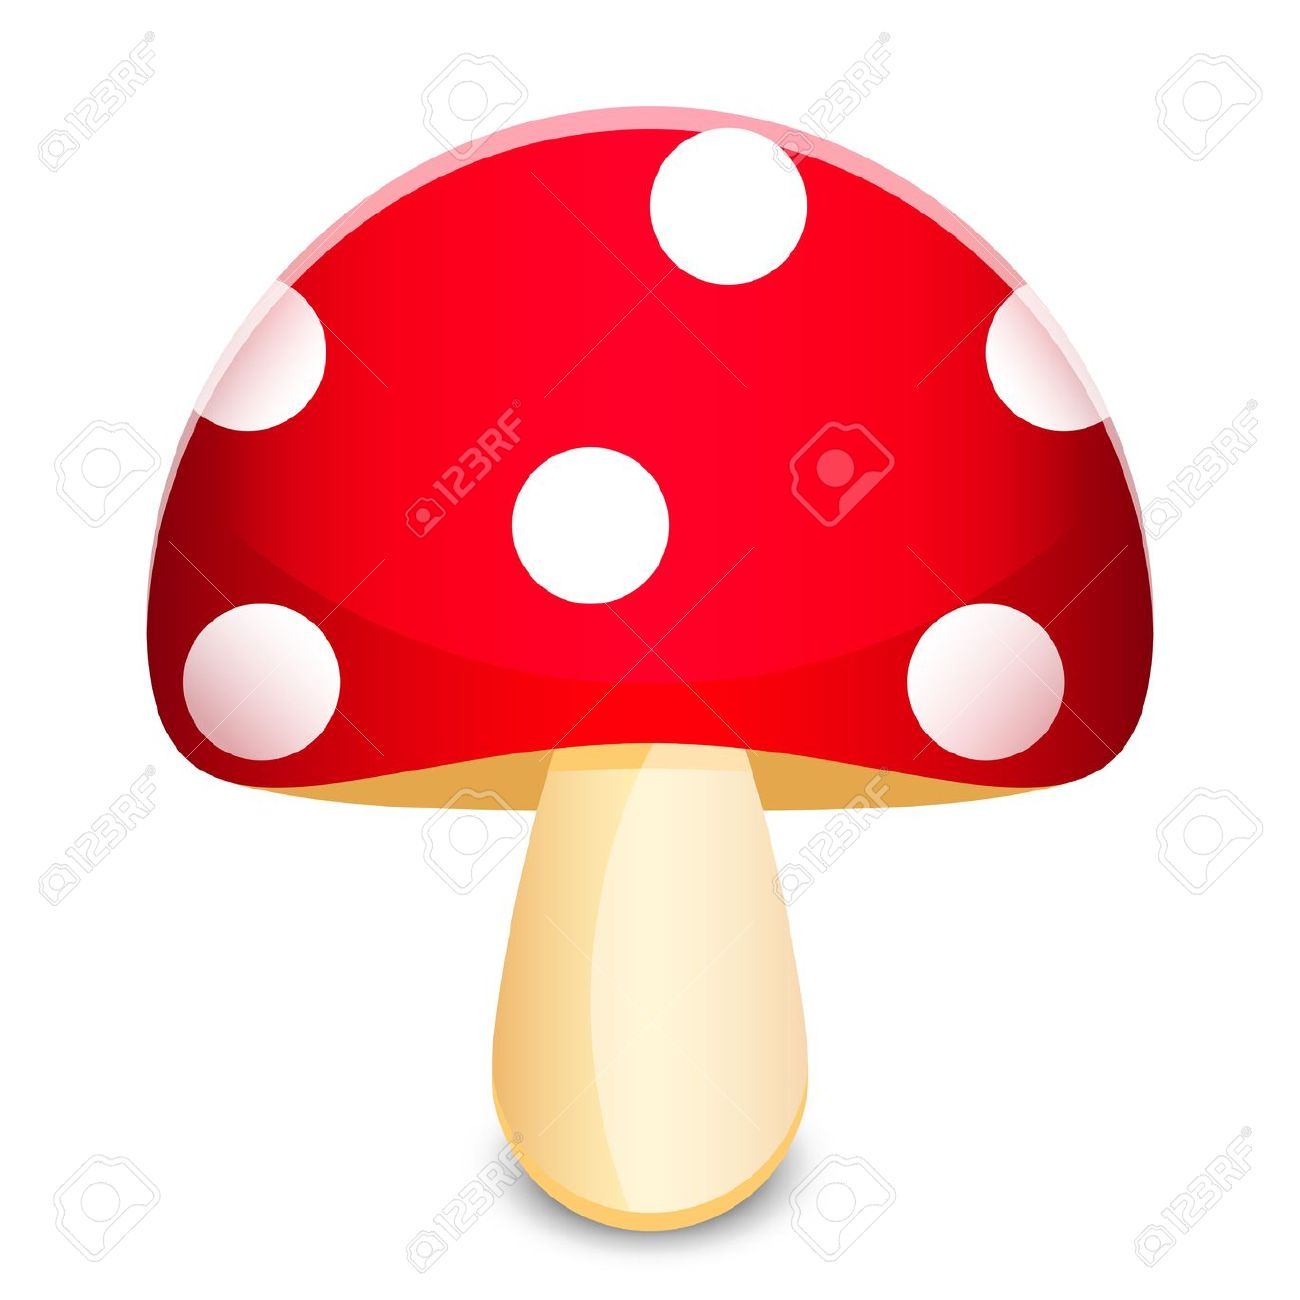 Clipart of mushroom 5 » Clipart Station.